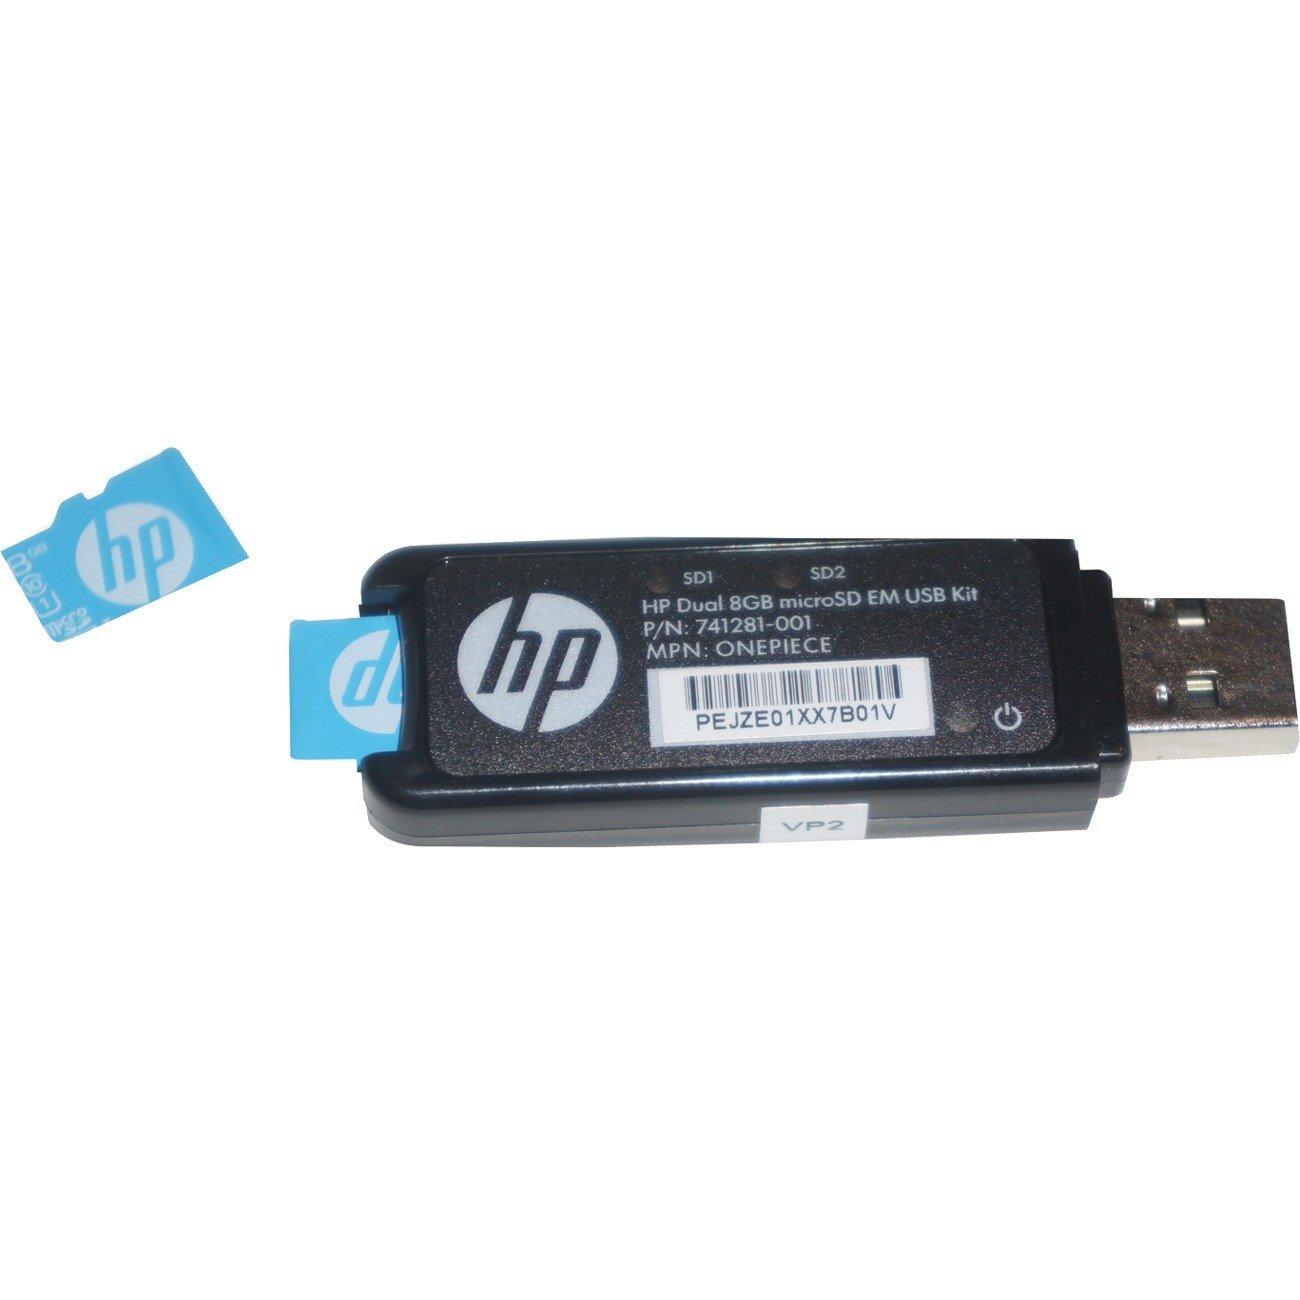 HPE Flash Media Kit - Dual 8GB microSD Enterprise Midline USB Kit - Media Only